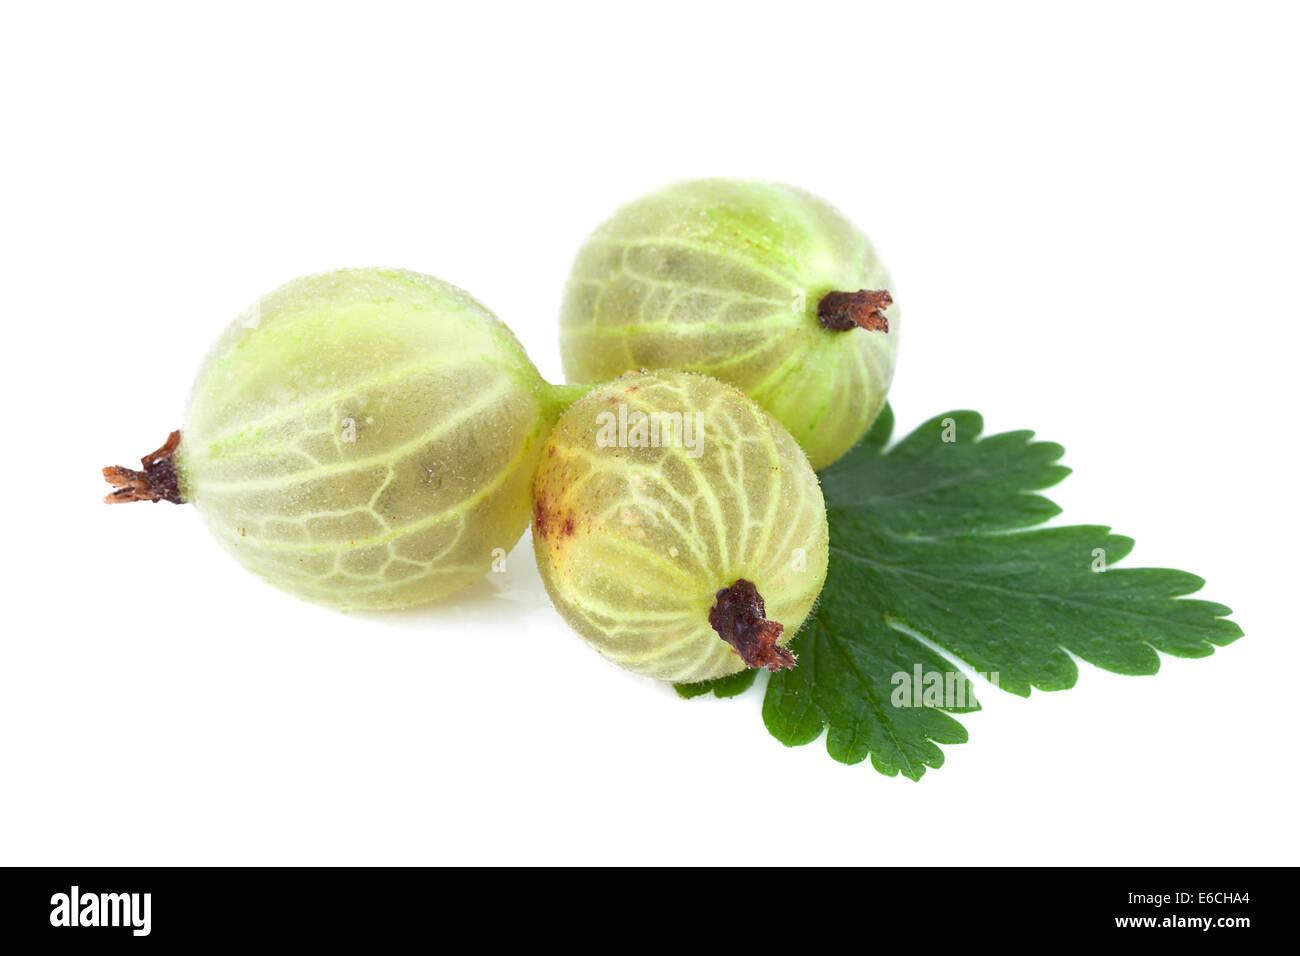 Gooseberry isolated - Stock Image